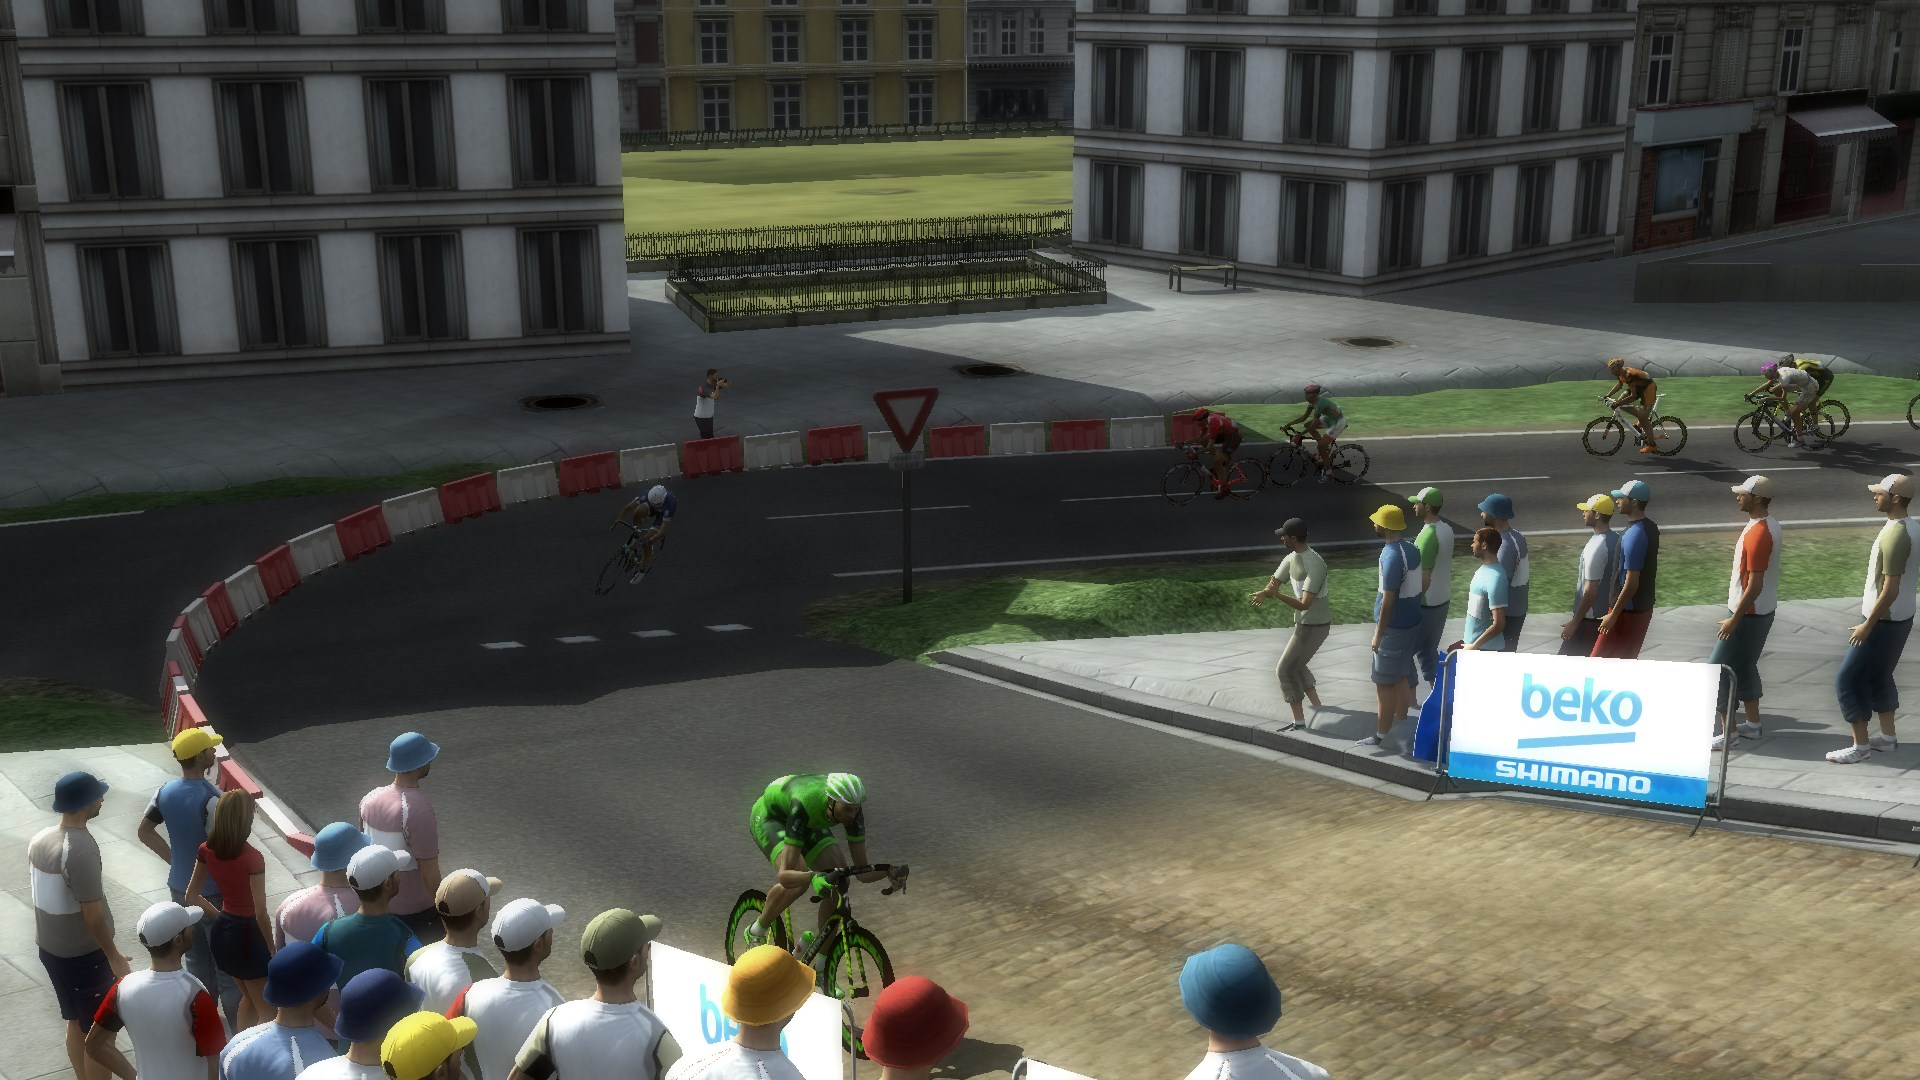 pcmdaily.com/images/mg/2017/Races/HC/lgp/lgp_20.jpg